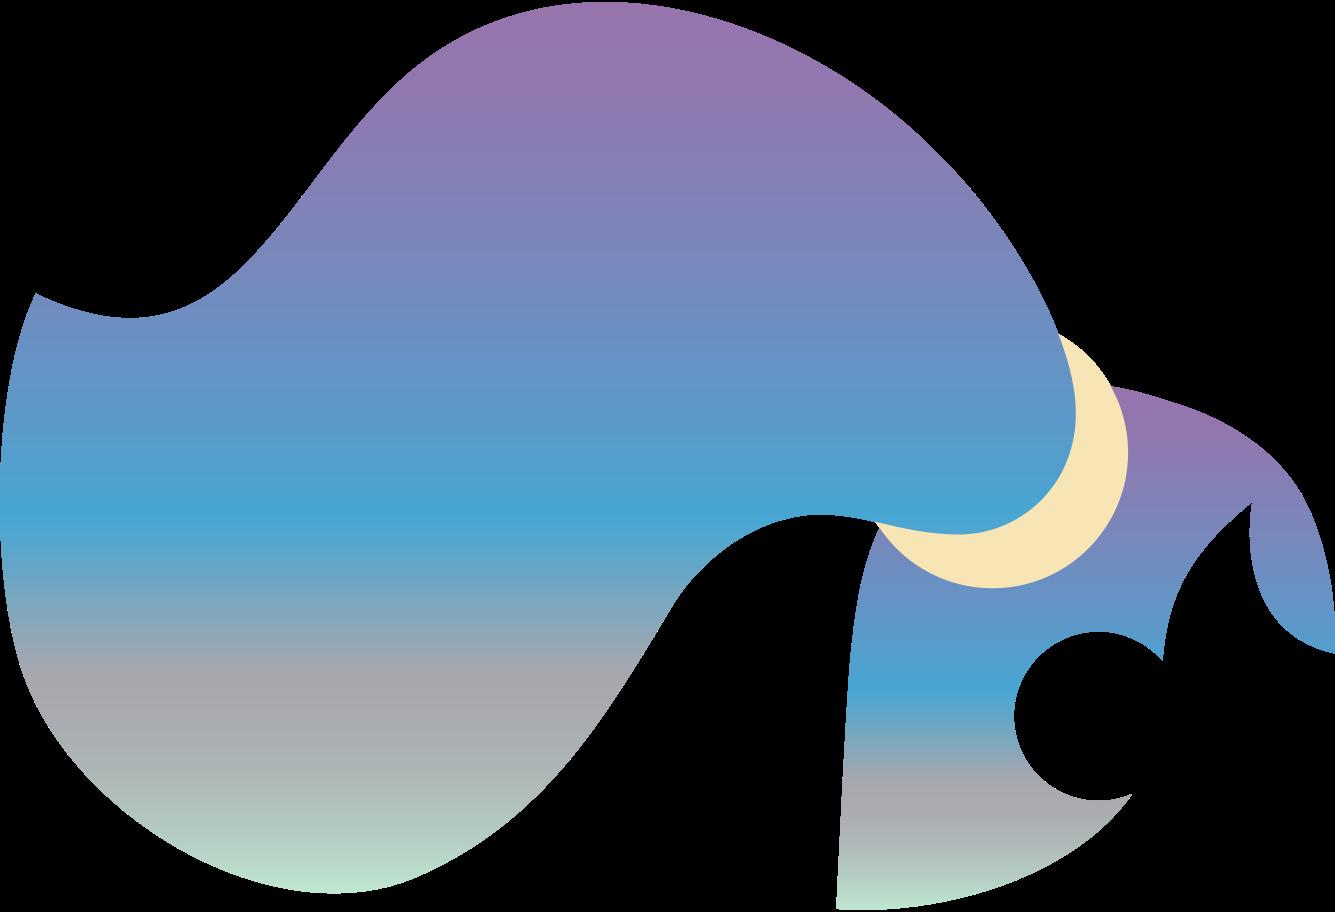 ponytail side parting gradient back Clipart illustration in PNG, SVG